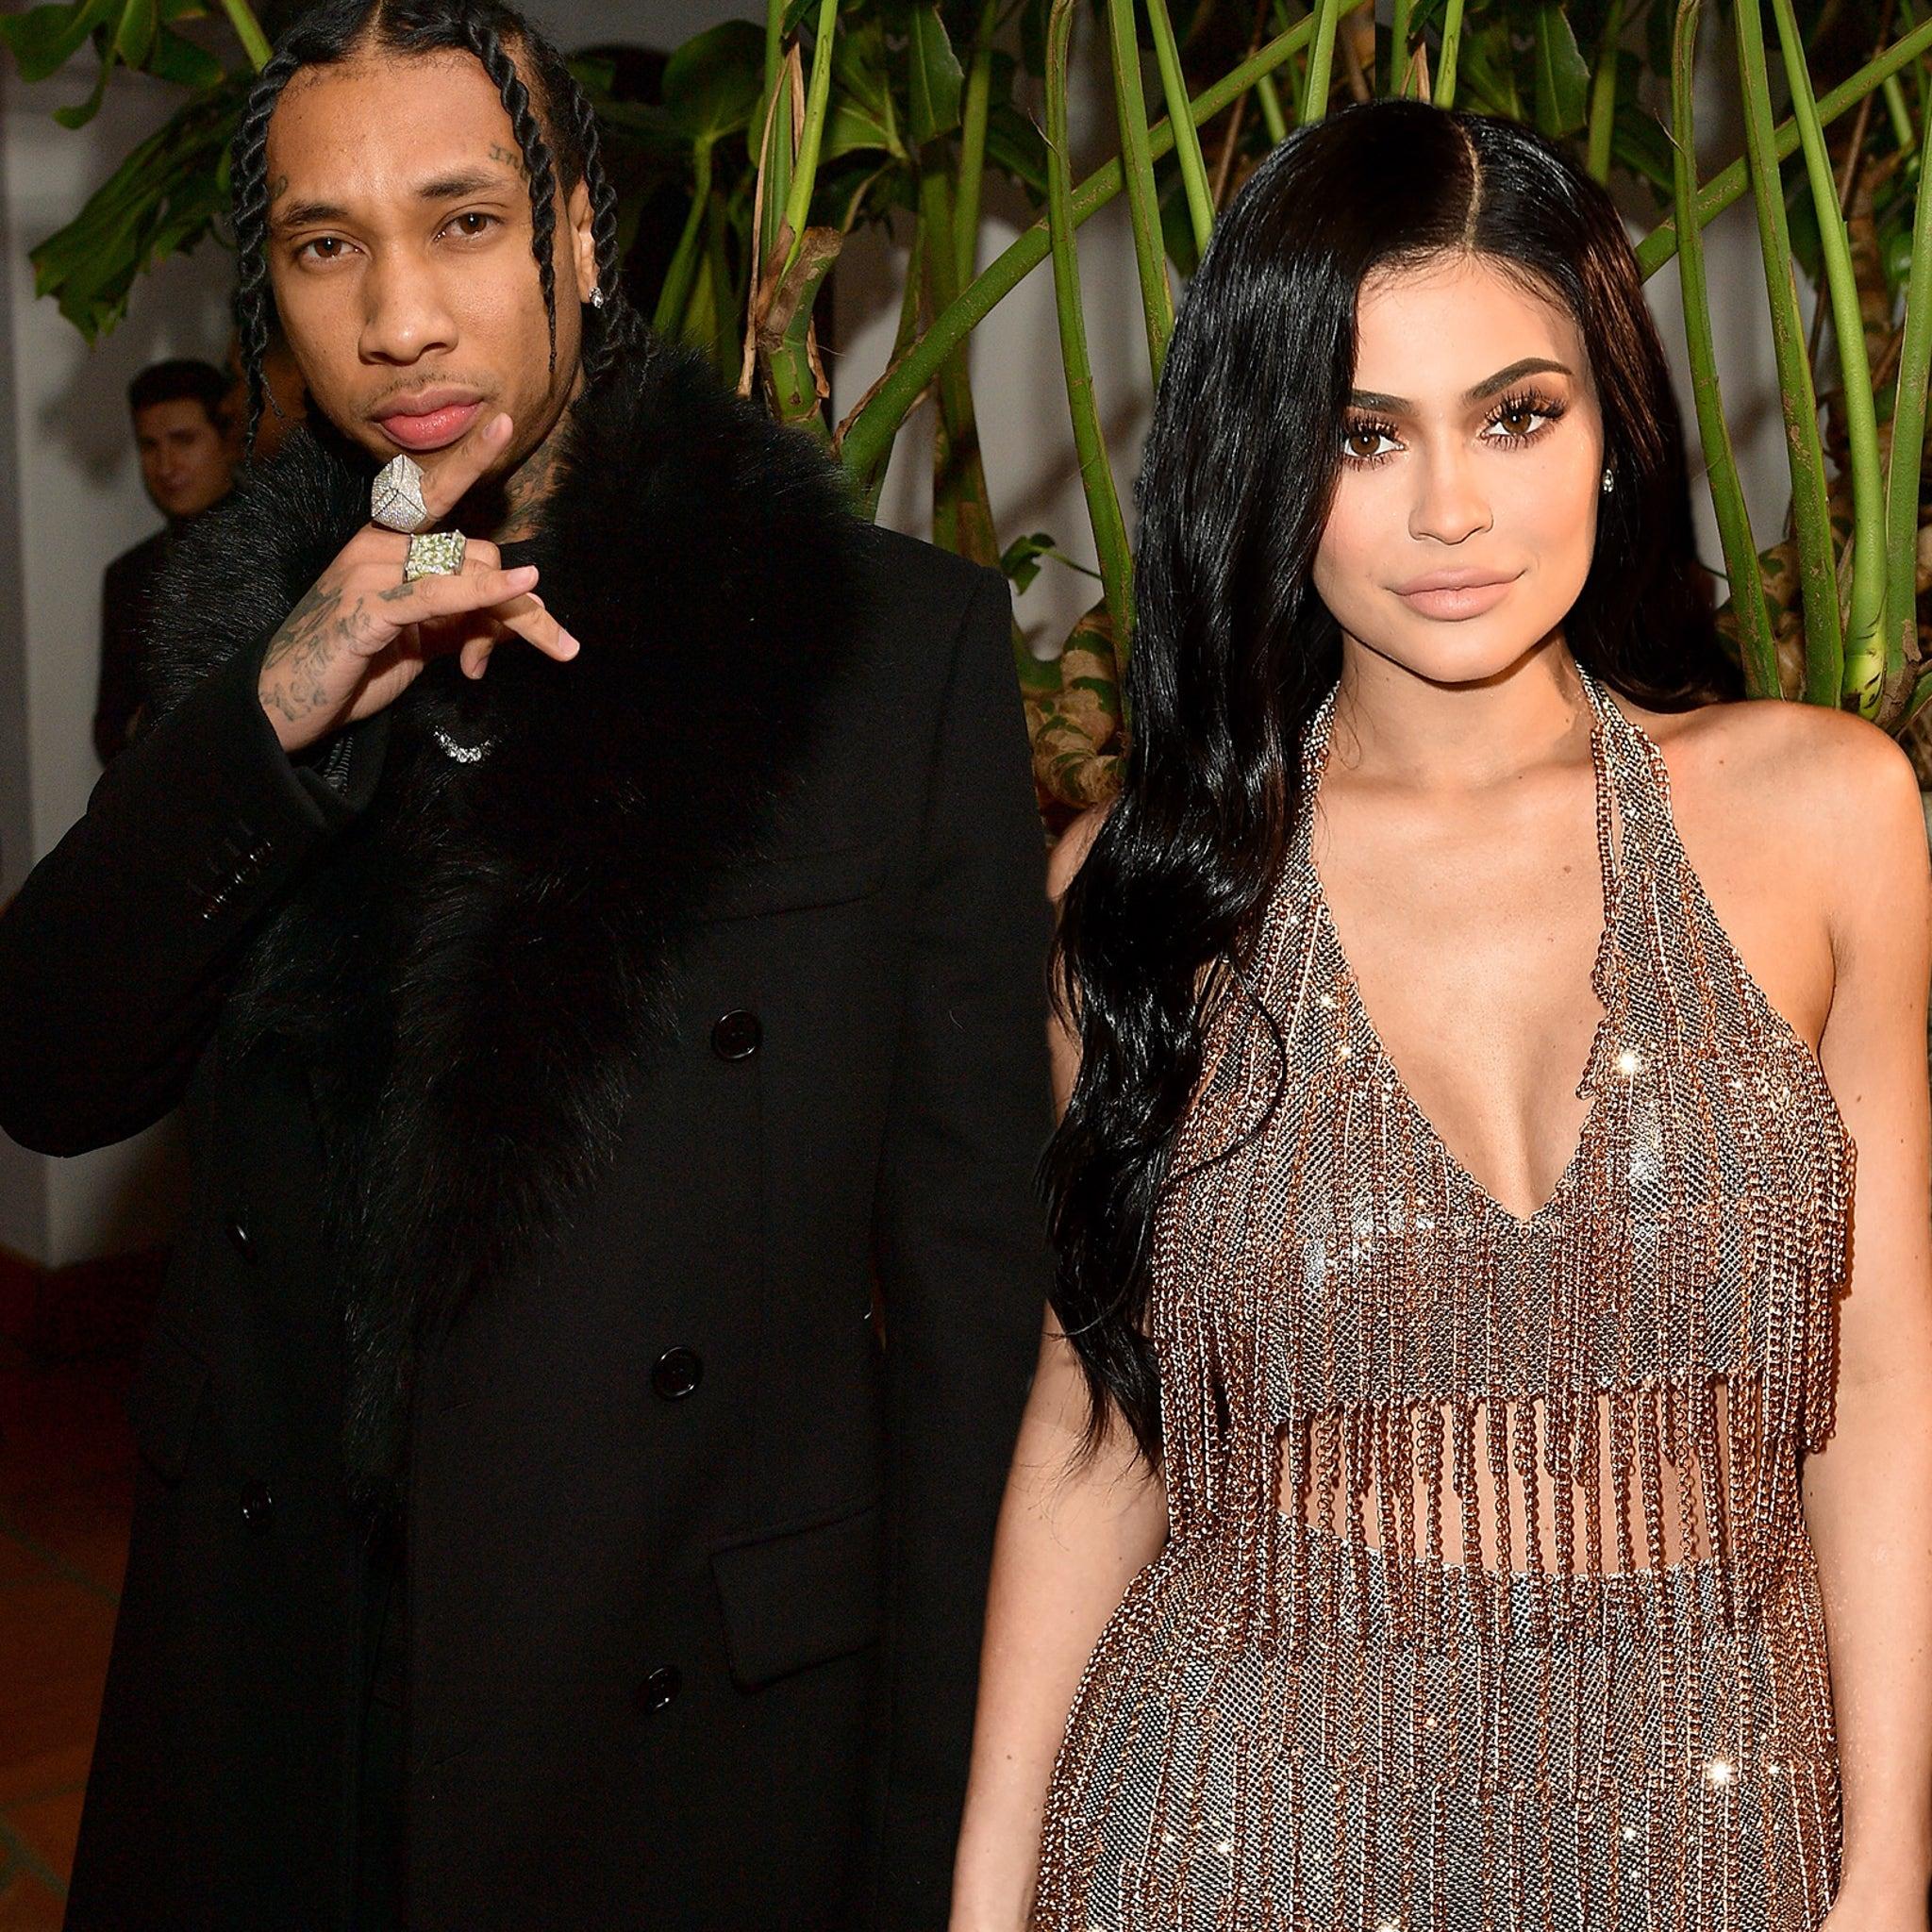 Kylie Jenner And Tyga Photoshoot